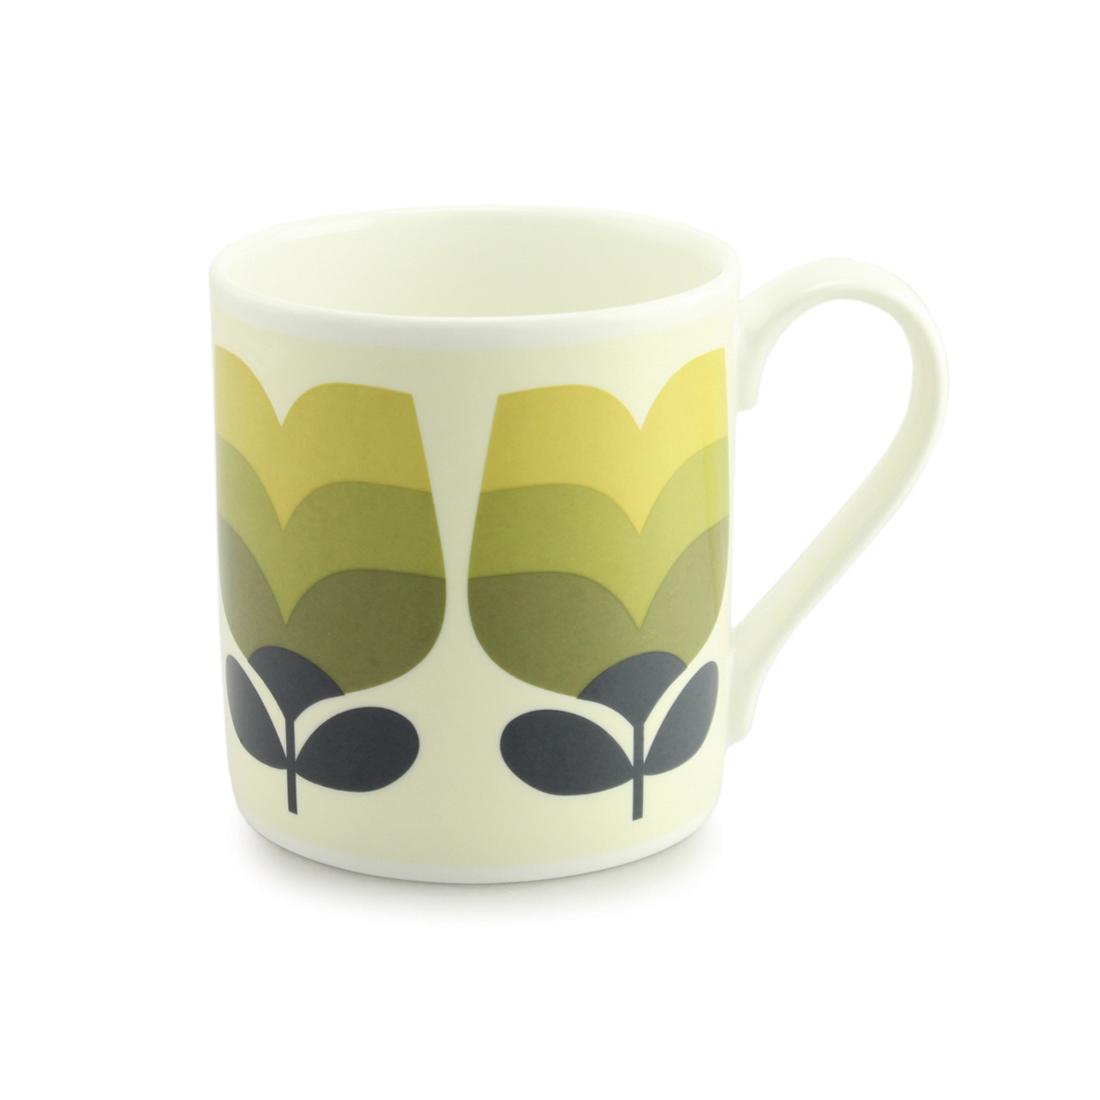 Orla Kiely Quite Big Mug - Olive Tonal Striped Tulip